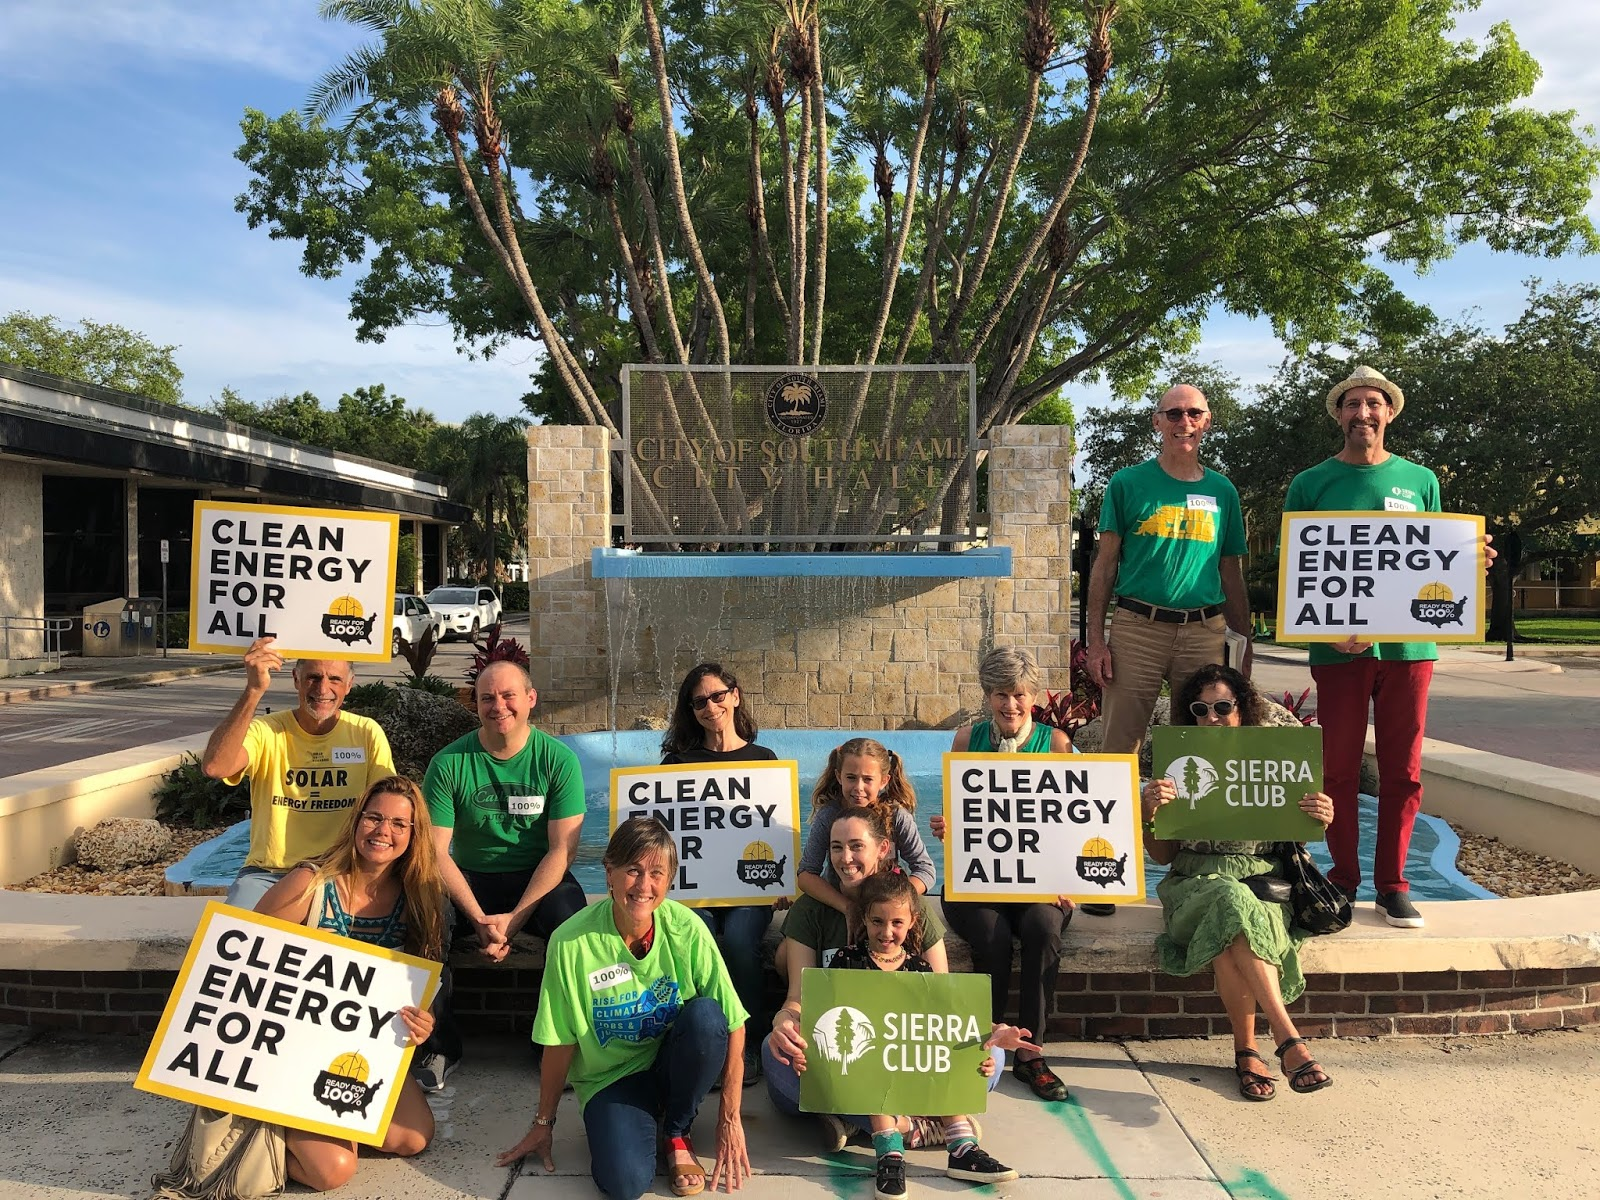 Sierra Club Florida News: South Miami Becomes Eighth Florida